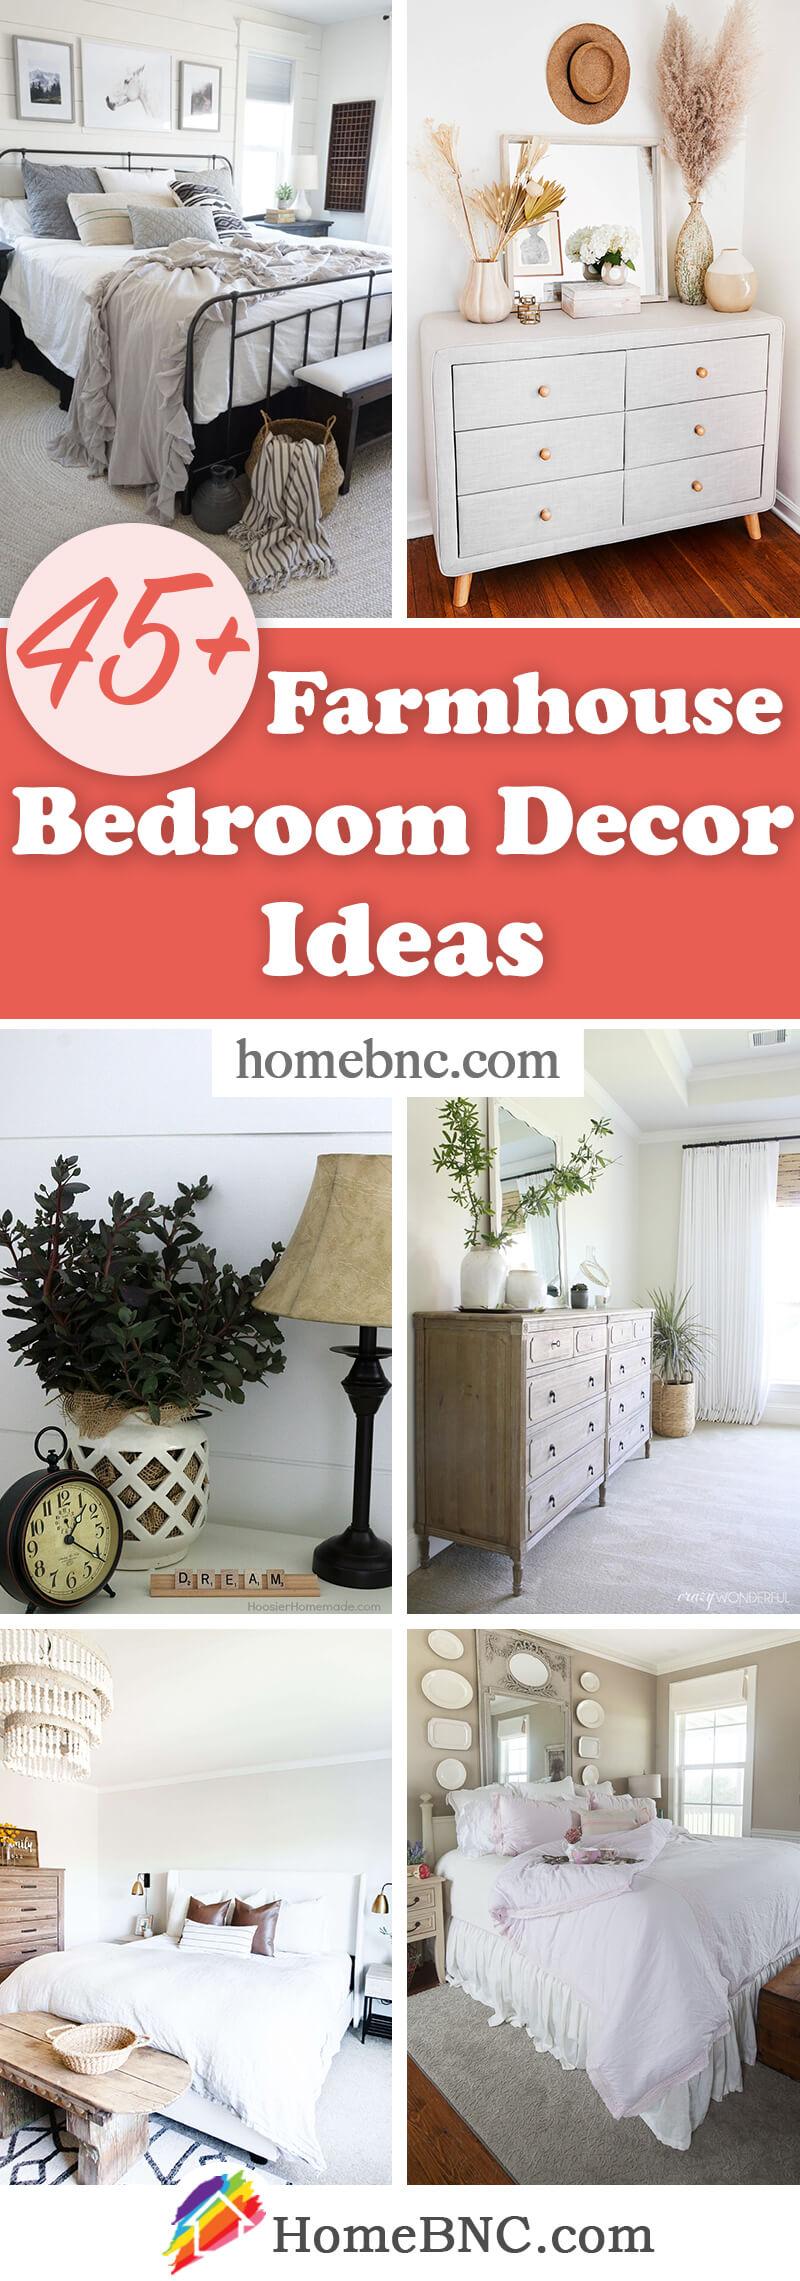 Farmhouse Bedroom Decorations